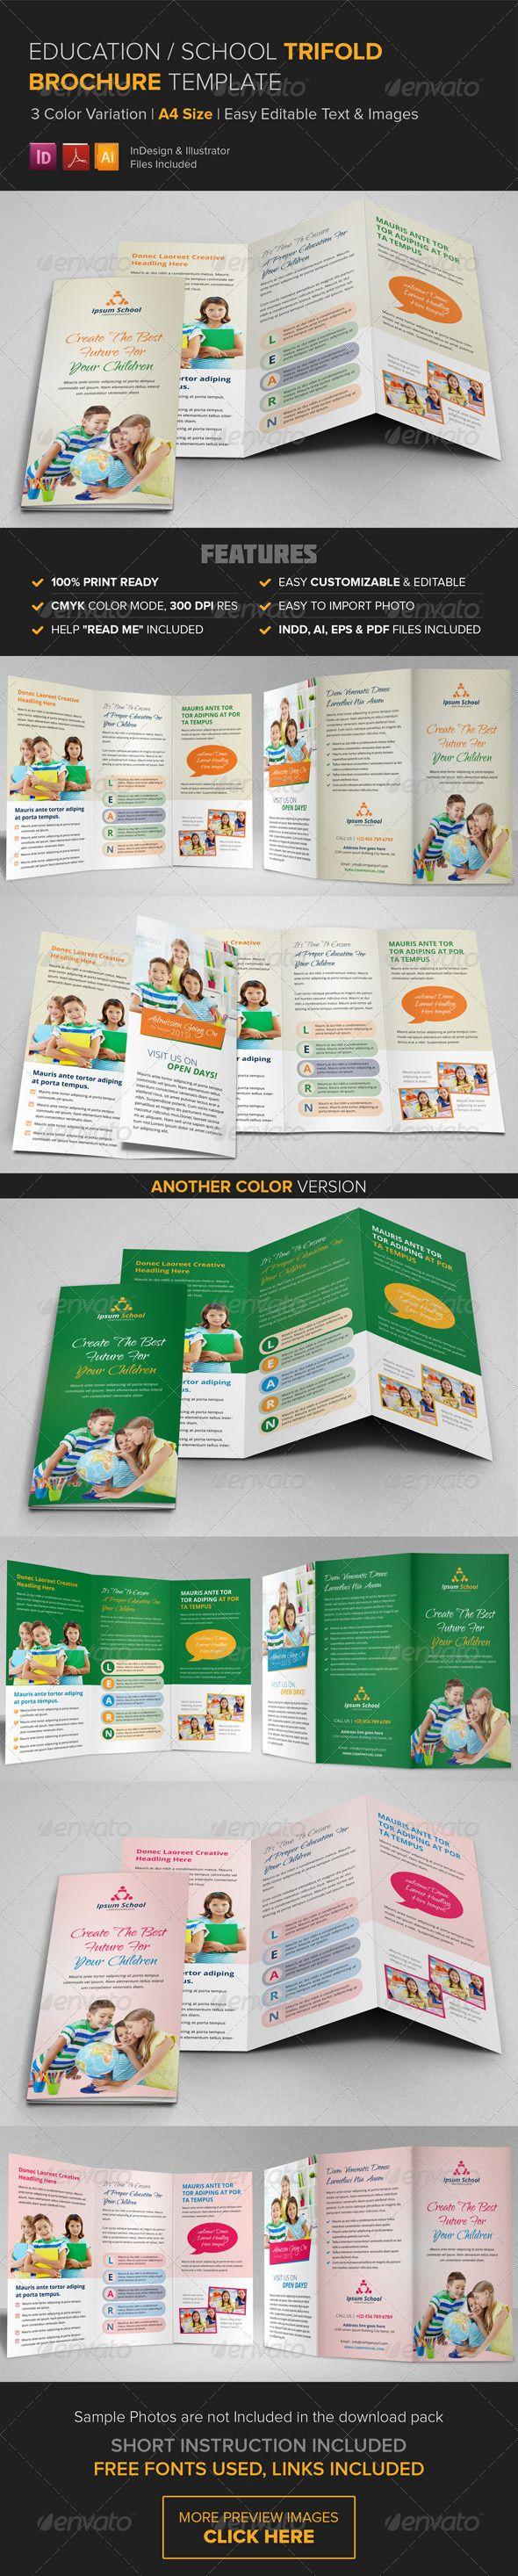 Education School Trifold Brochure Template